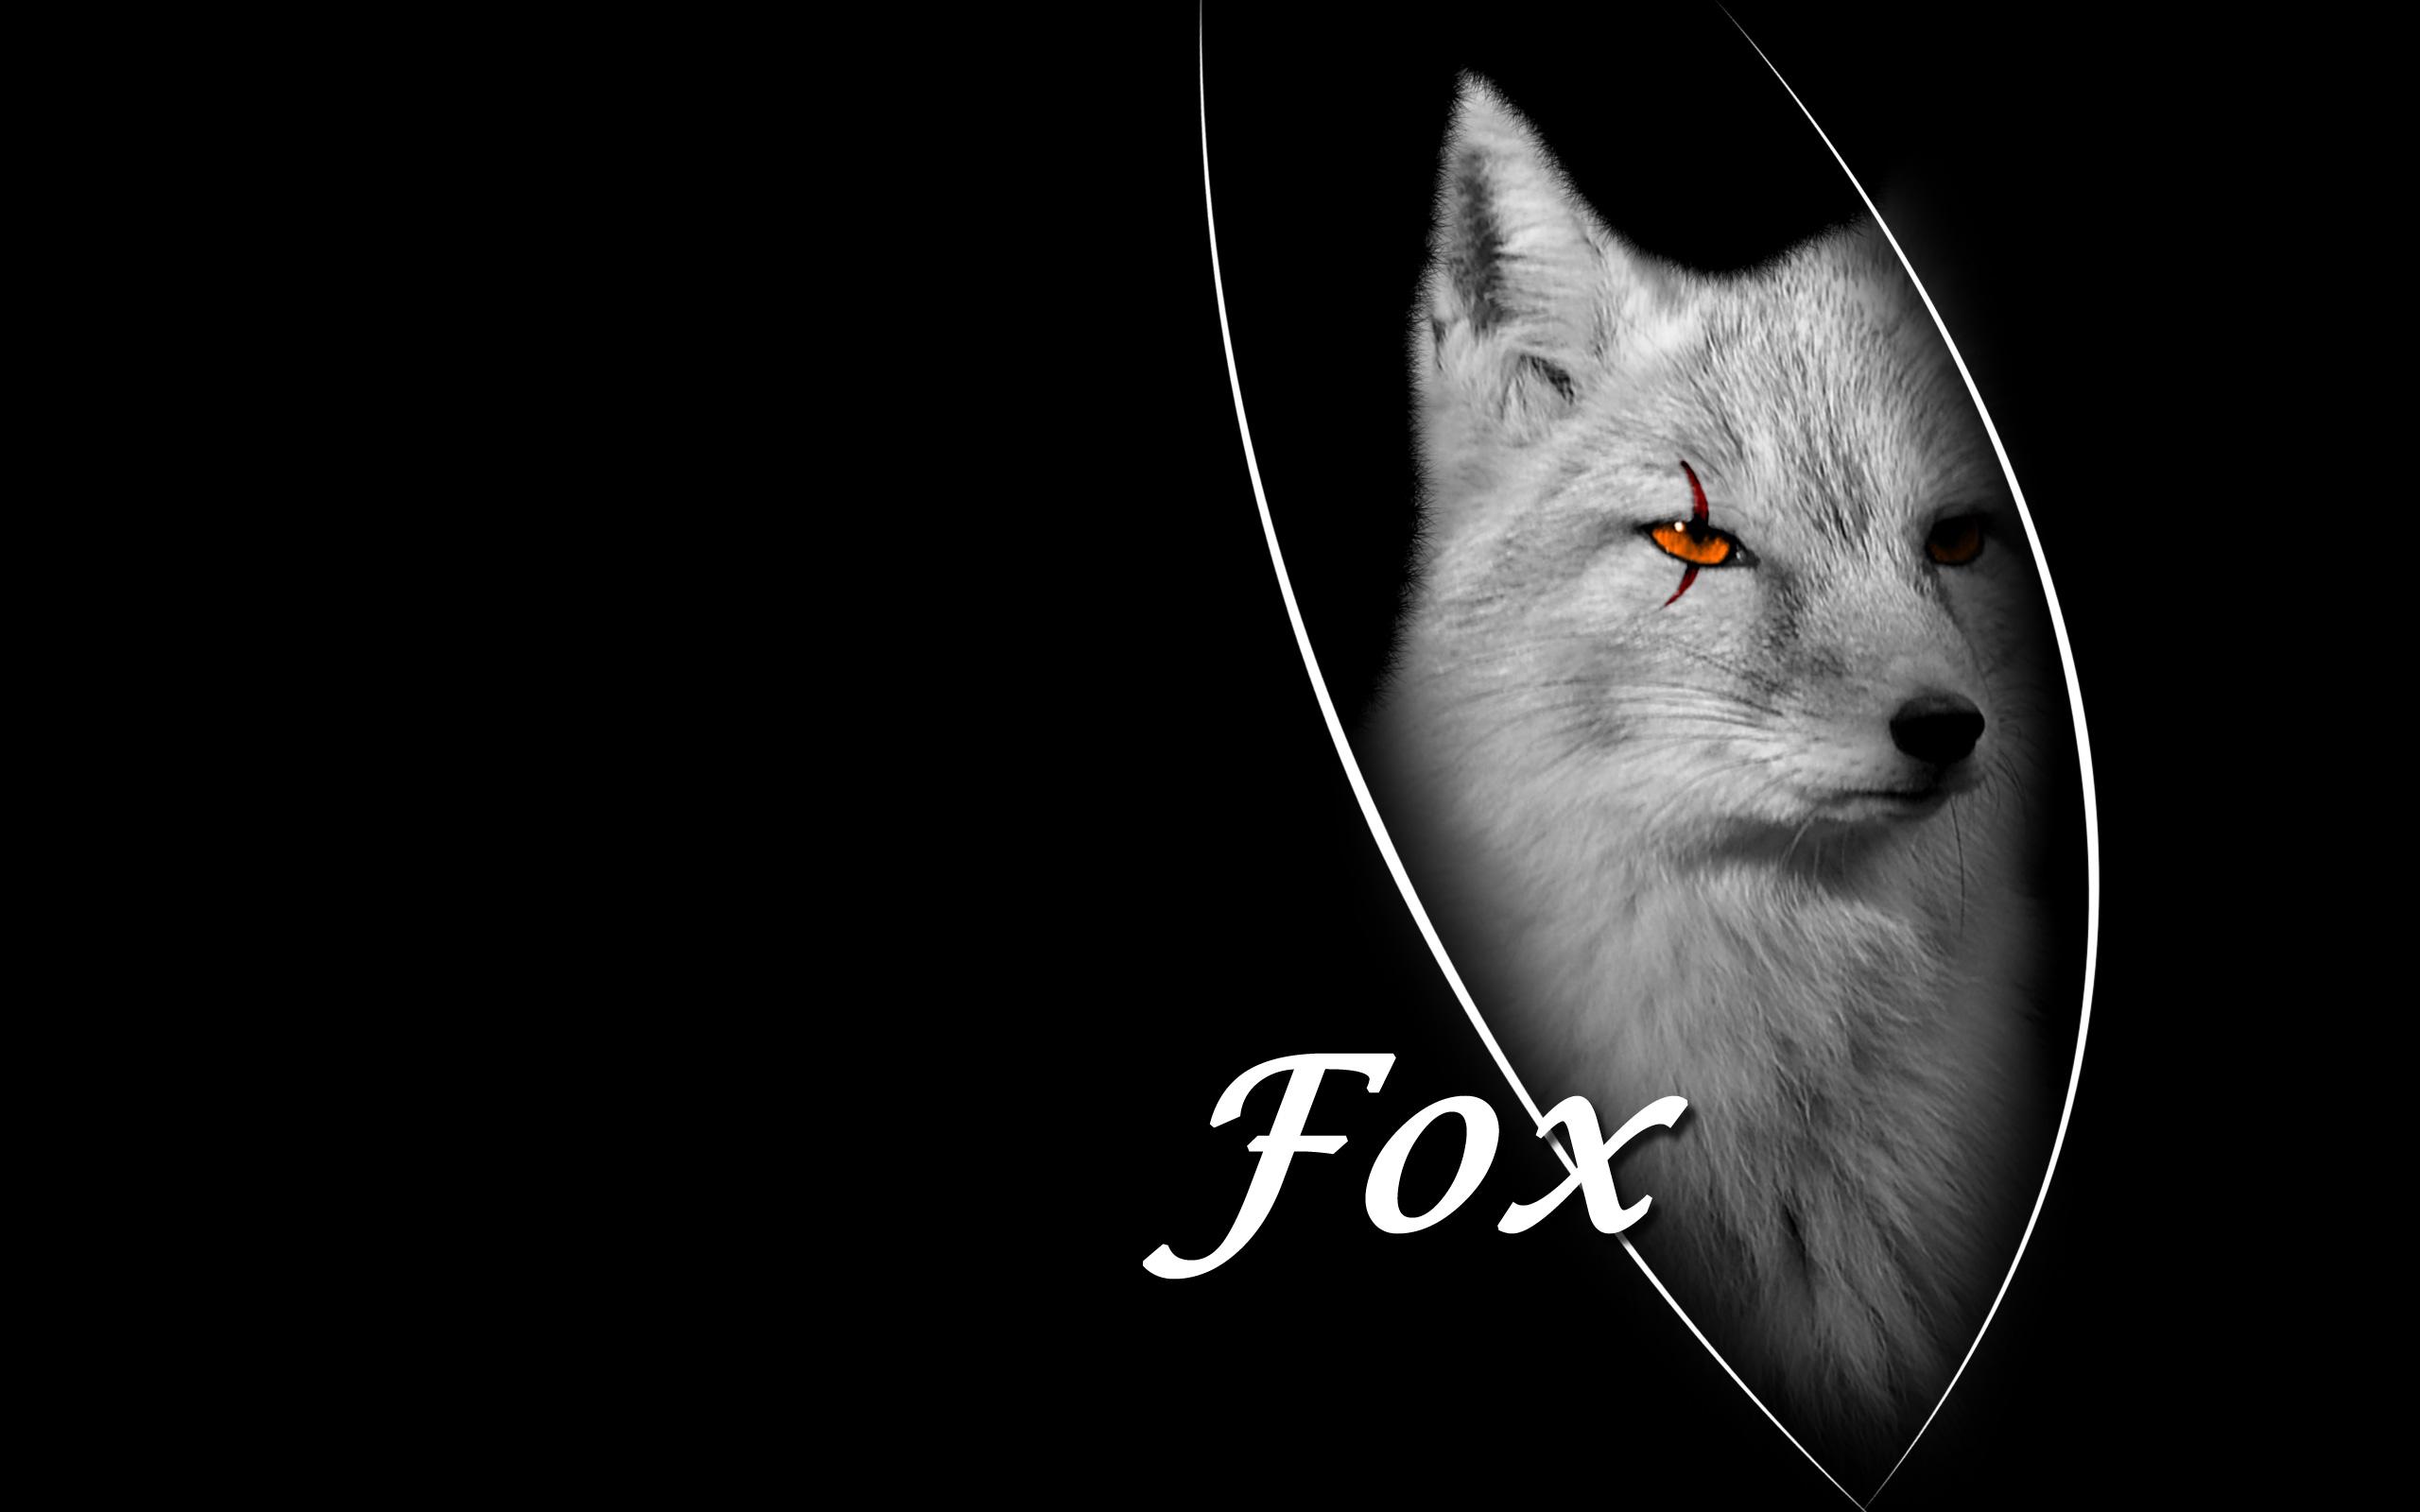 Cool Fox Wallpaper 2560x1600 12308